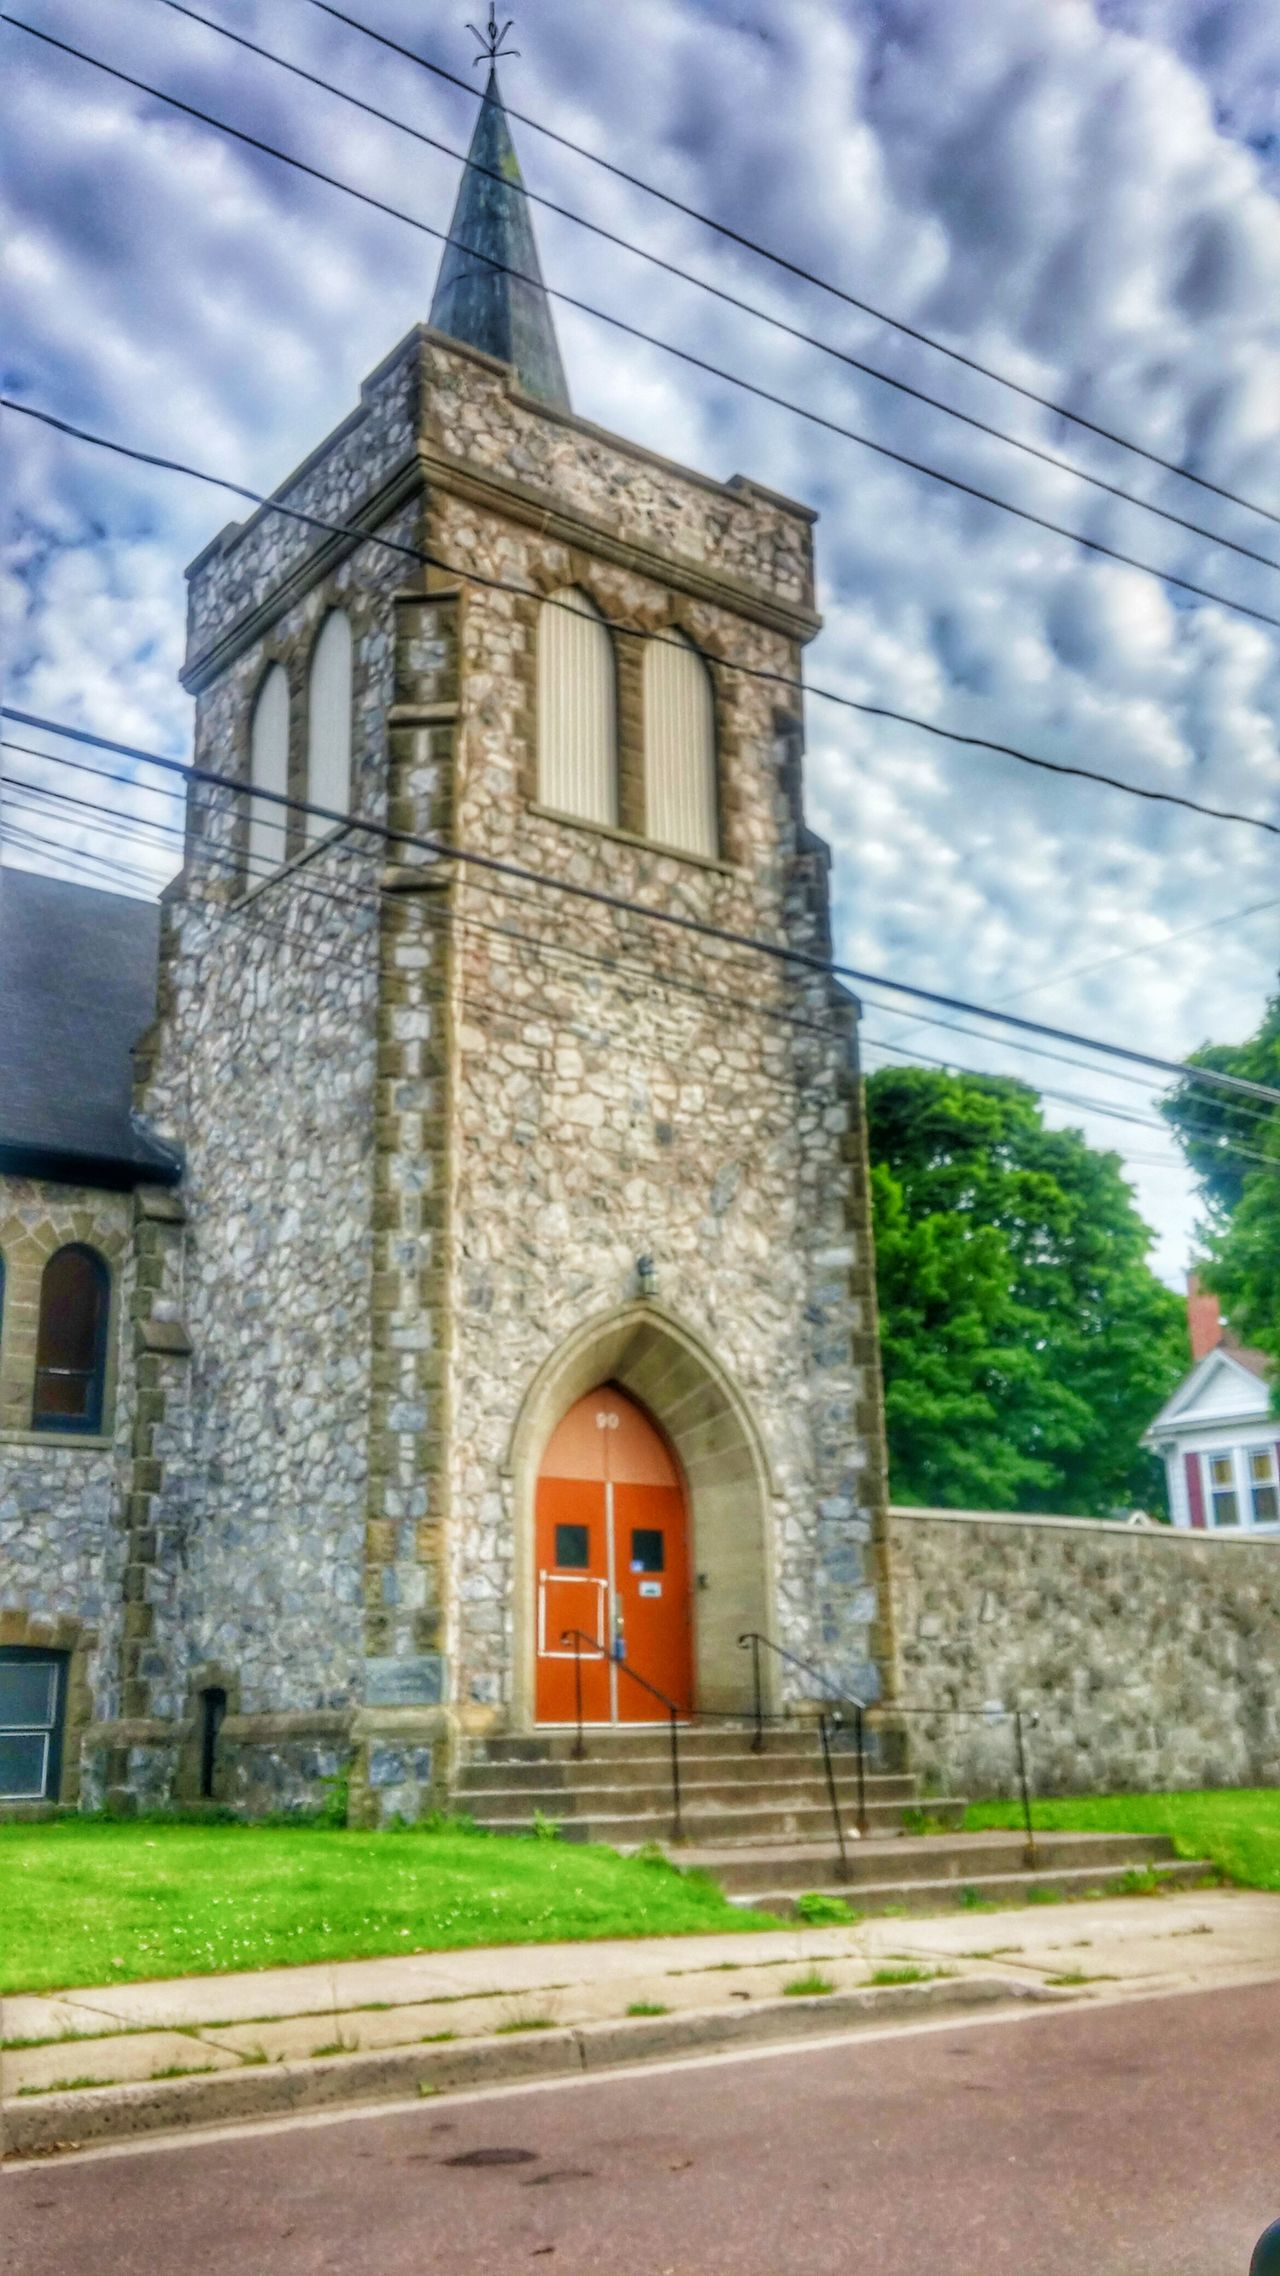 Cobblestone Church Historical Intriguing Mystery Vivid Beholding Church Tower